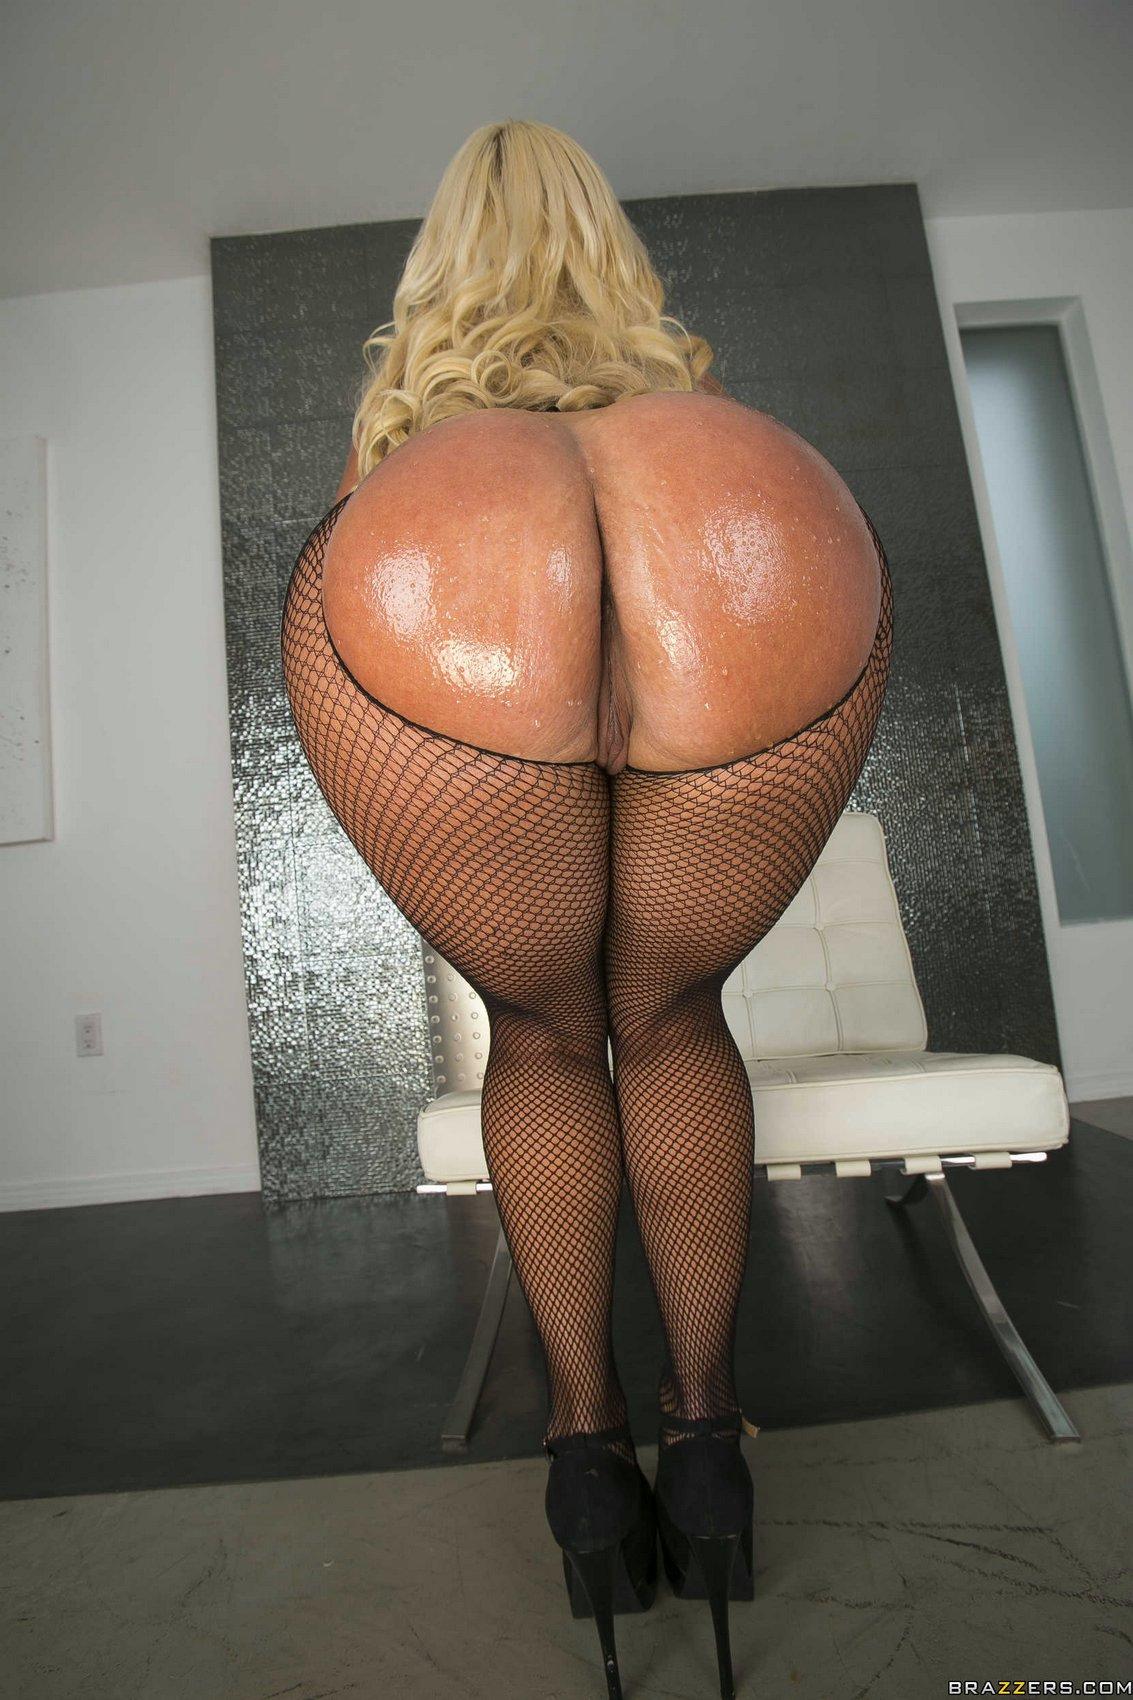 Huge ass stockings